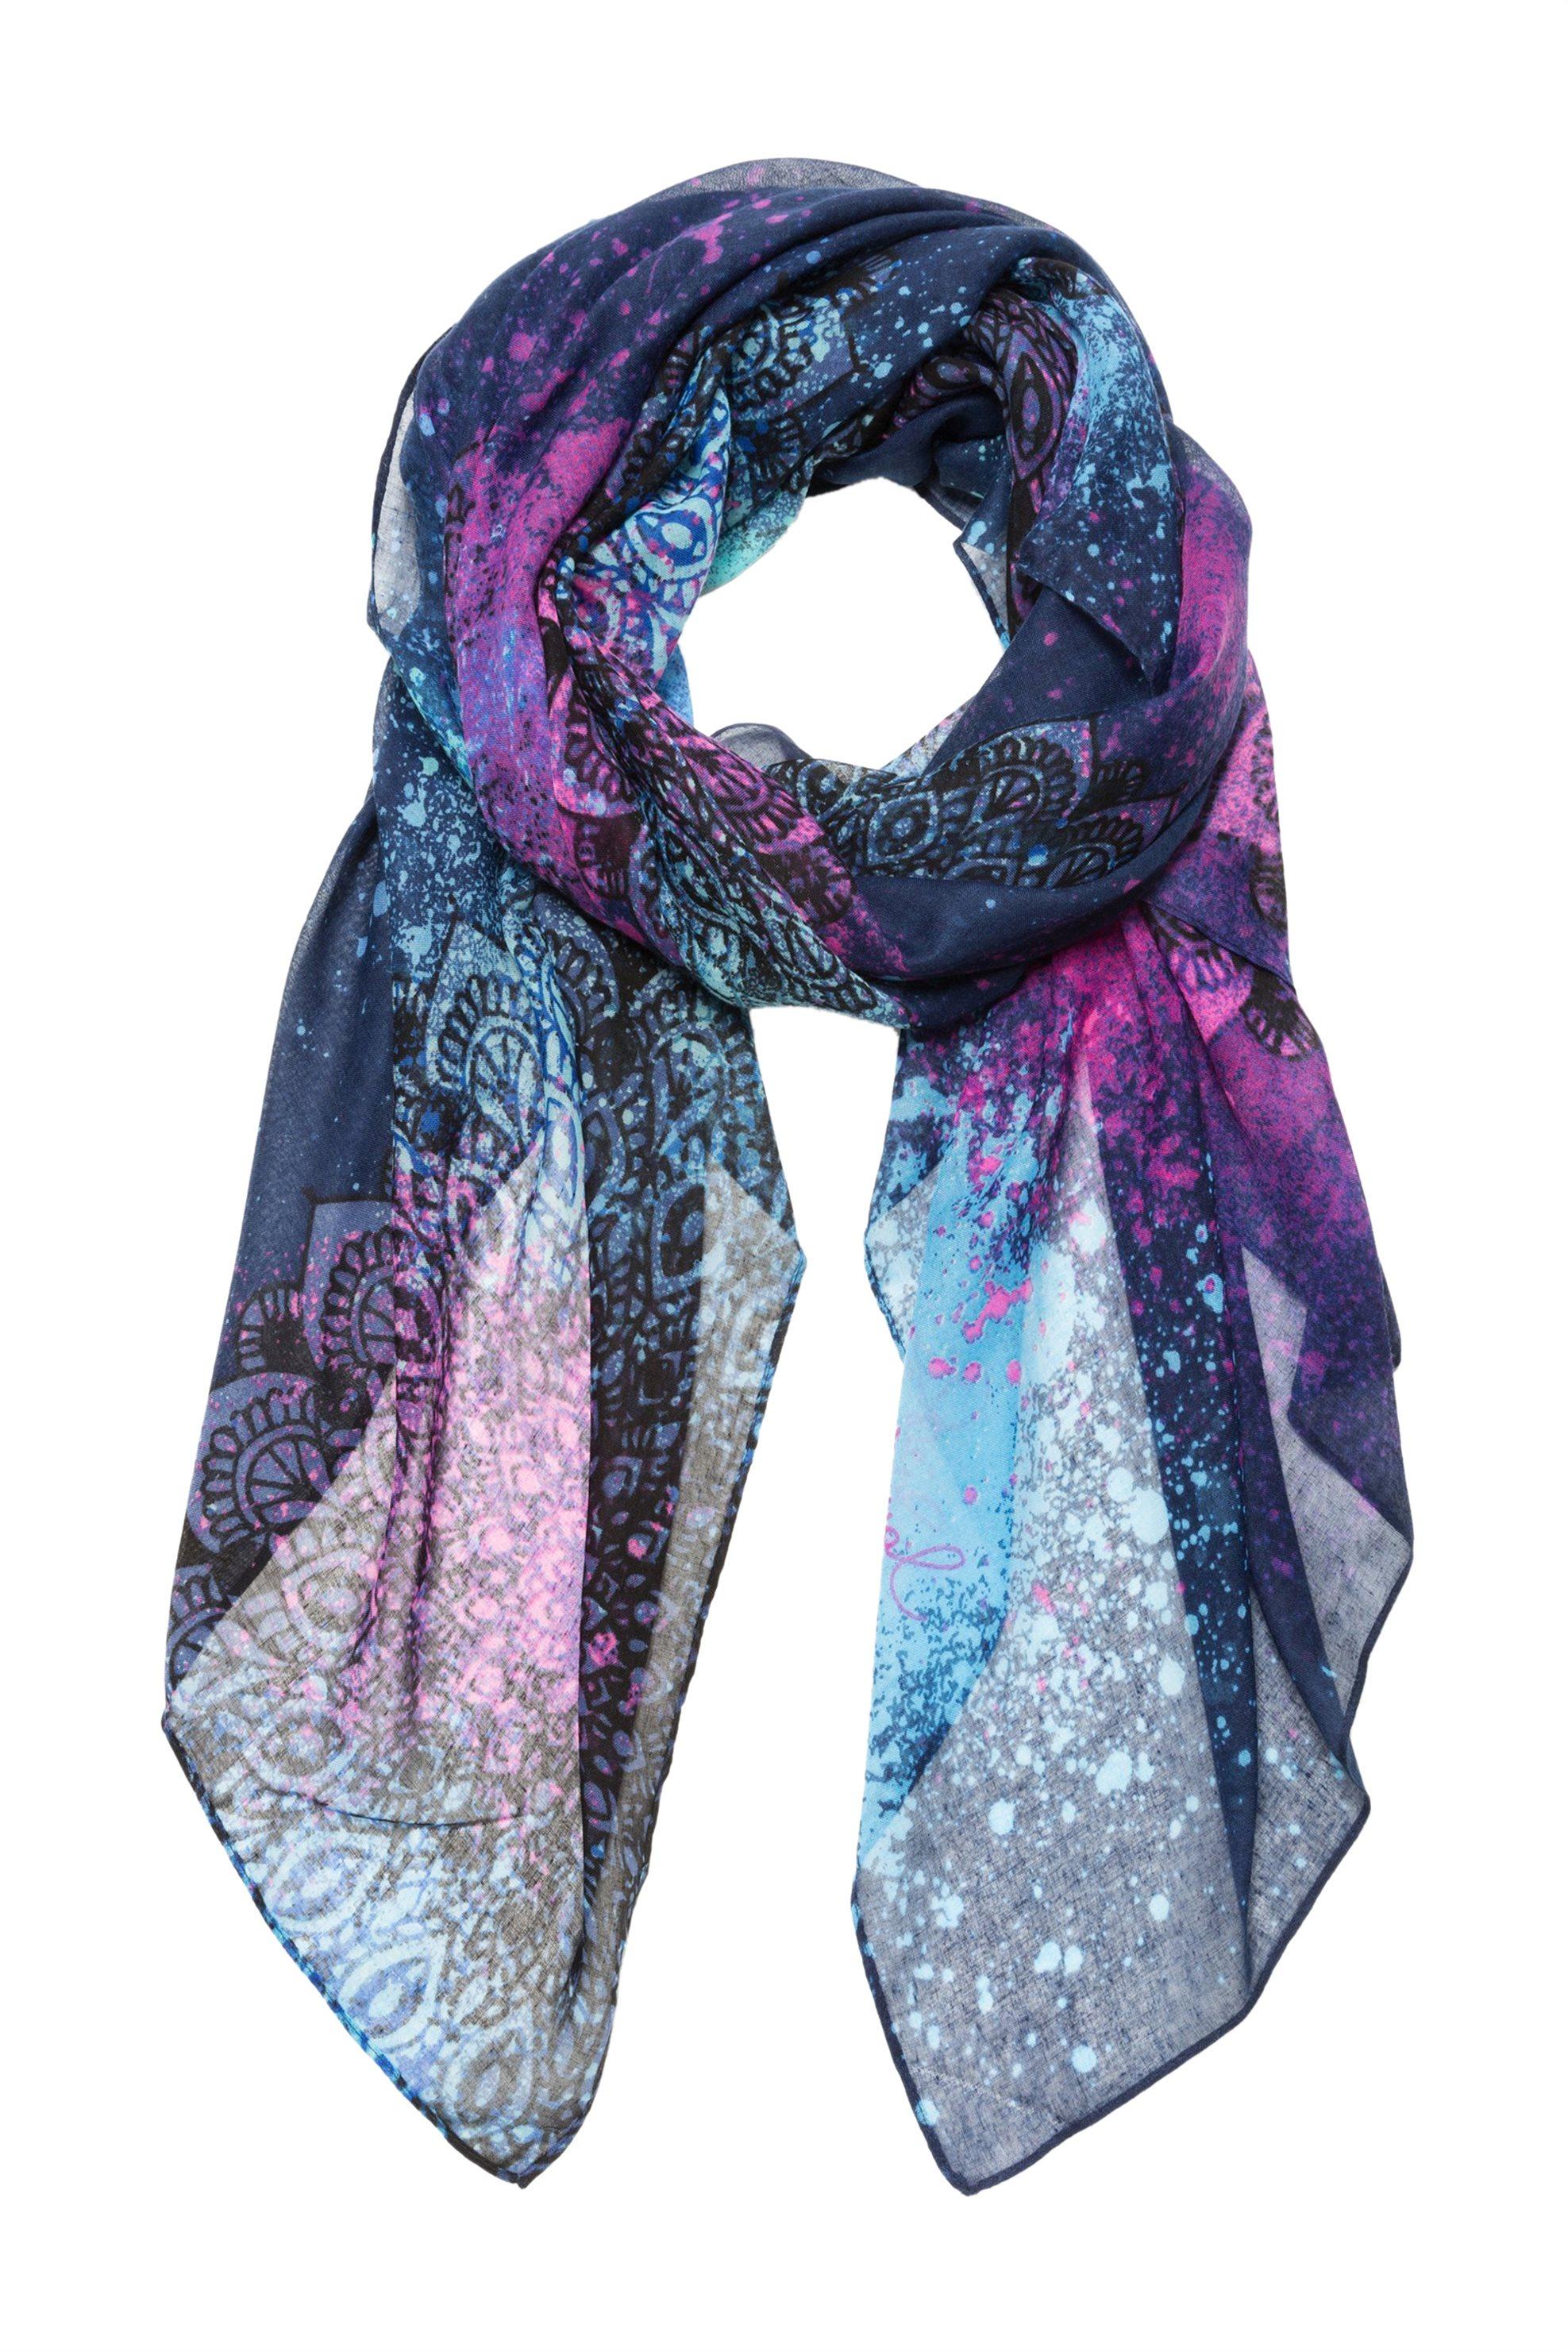 Desigual γυναικείο μαντήλι Spray Dots Rectangle - 18WAWW16 - Μπλε Σκούρο γυναικα   αξεσουαρ   κασκόλ   μαντήλια